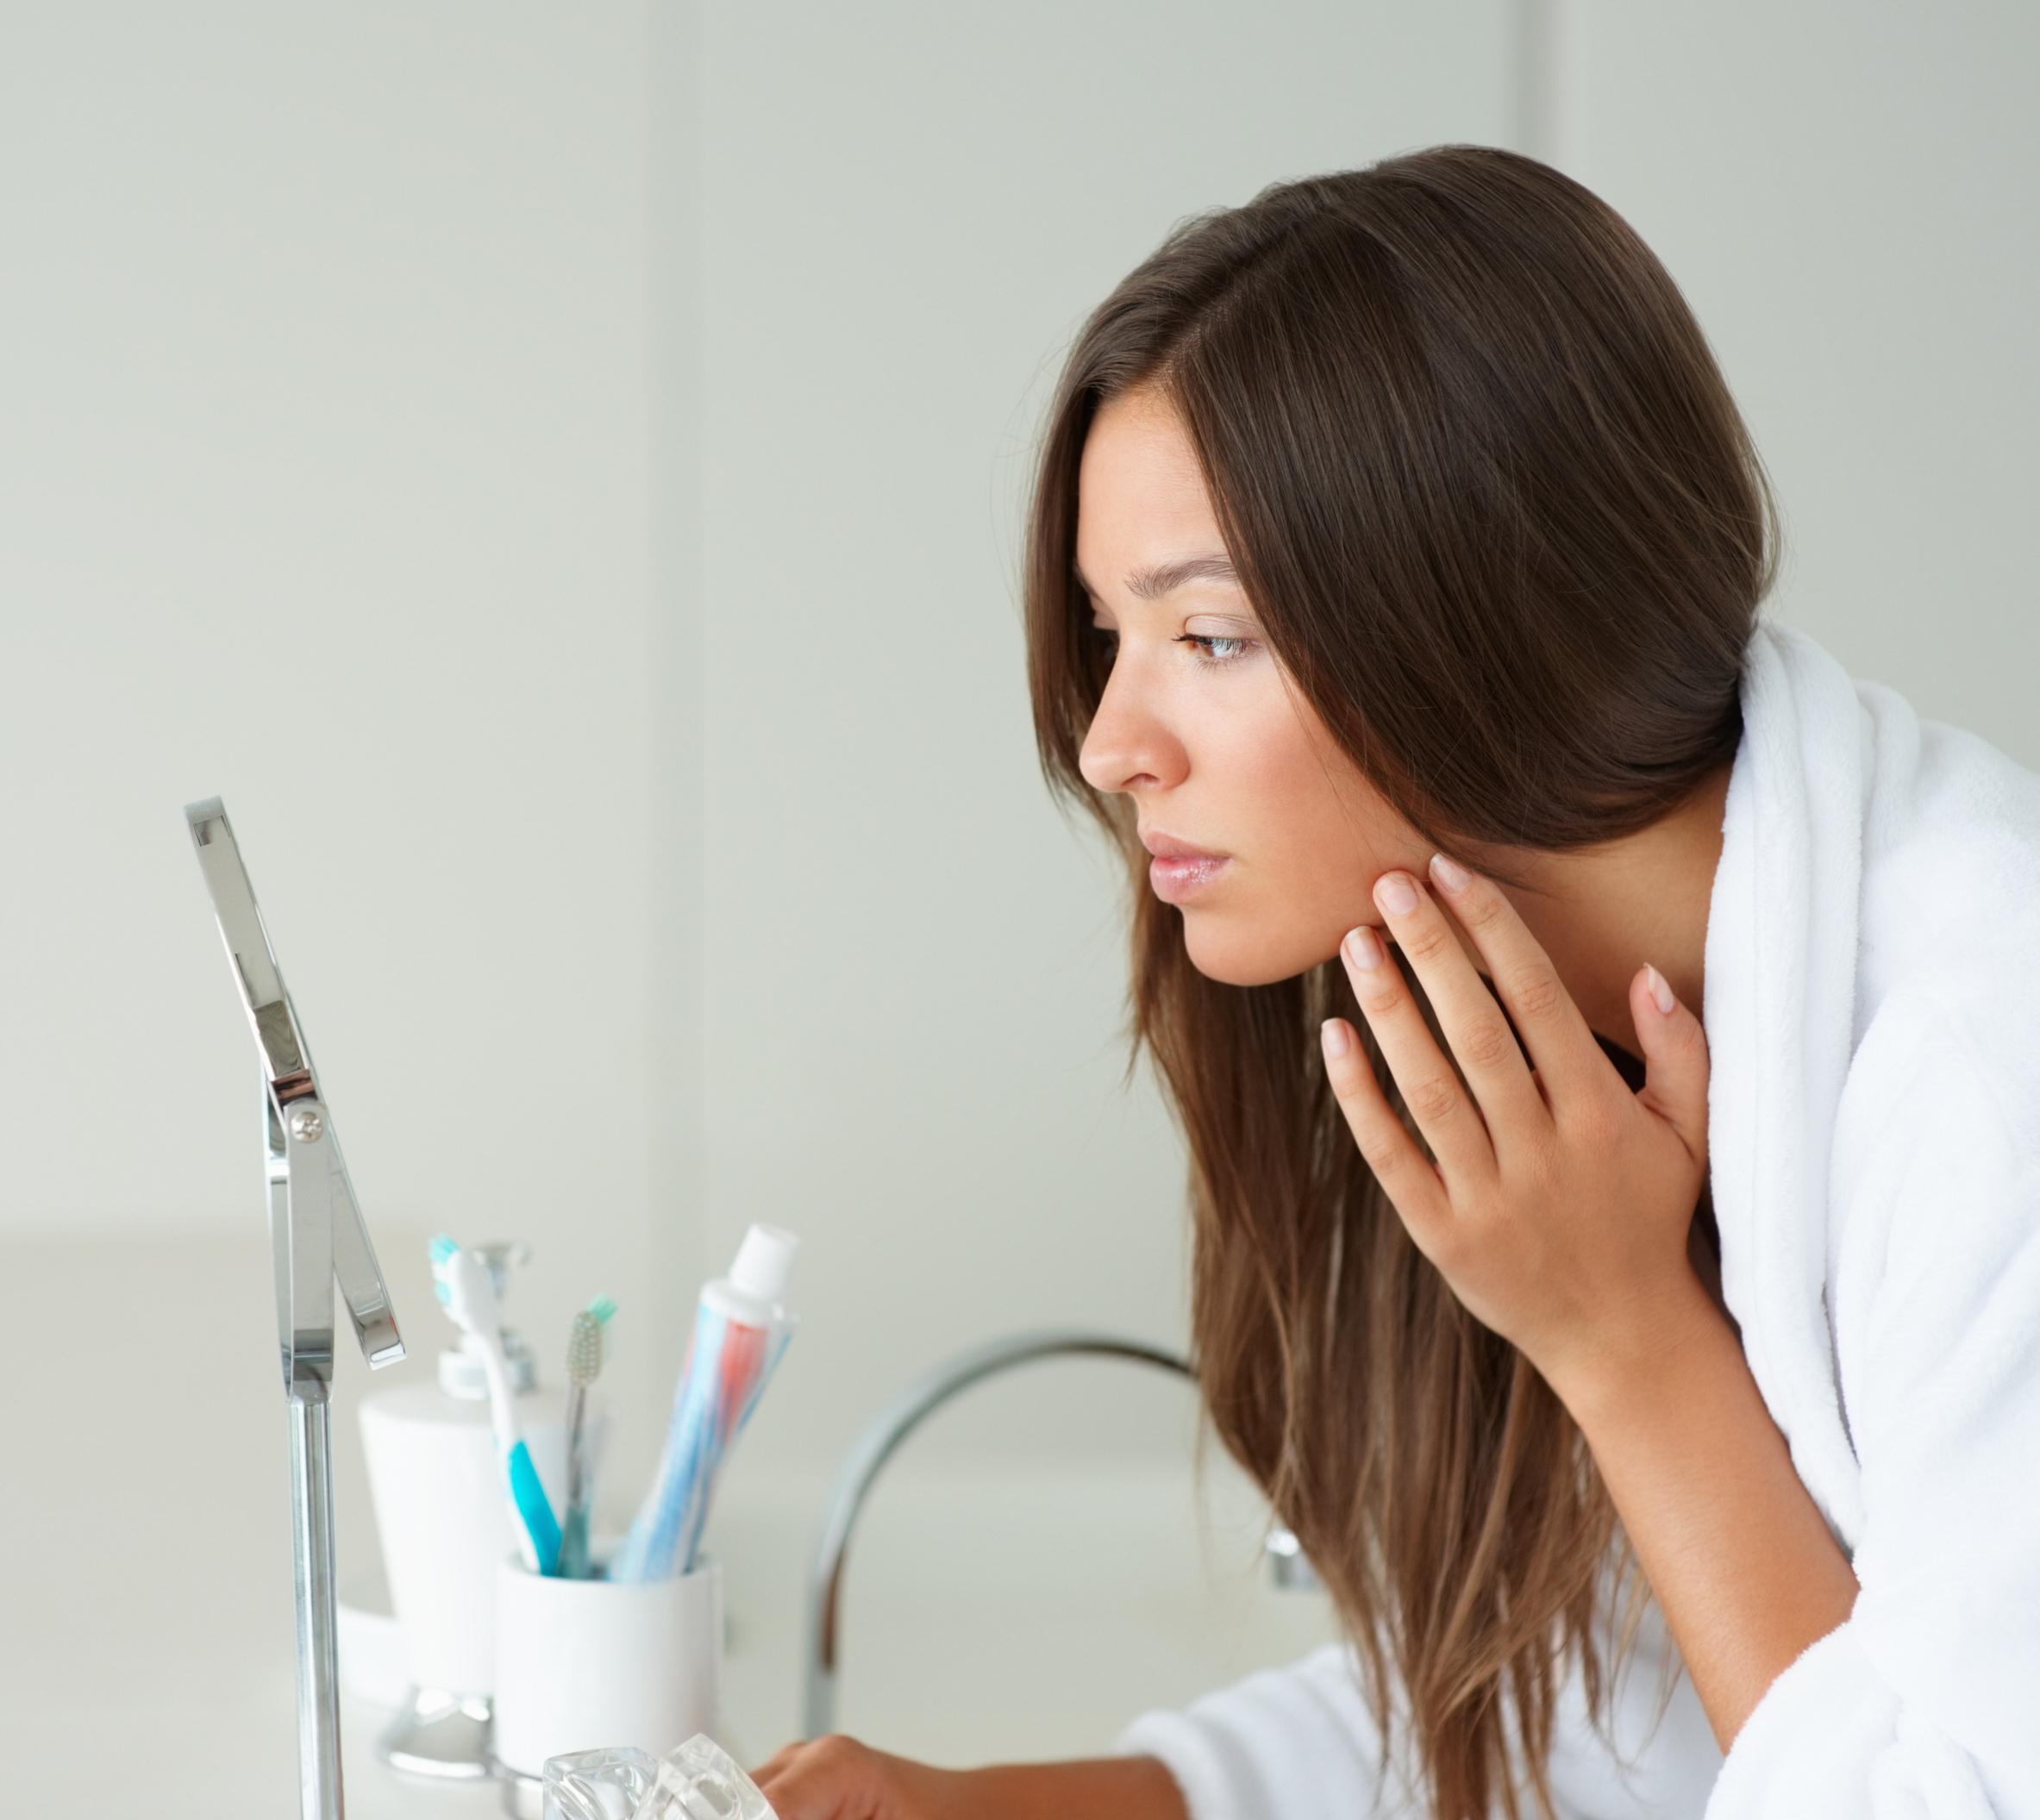 hpv vaccine eliminates skin cancer